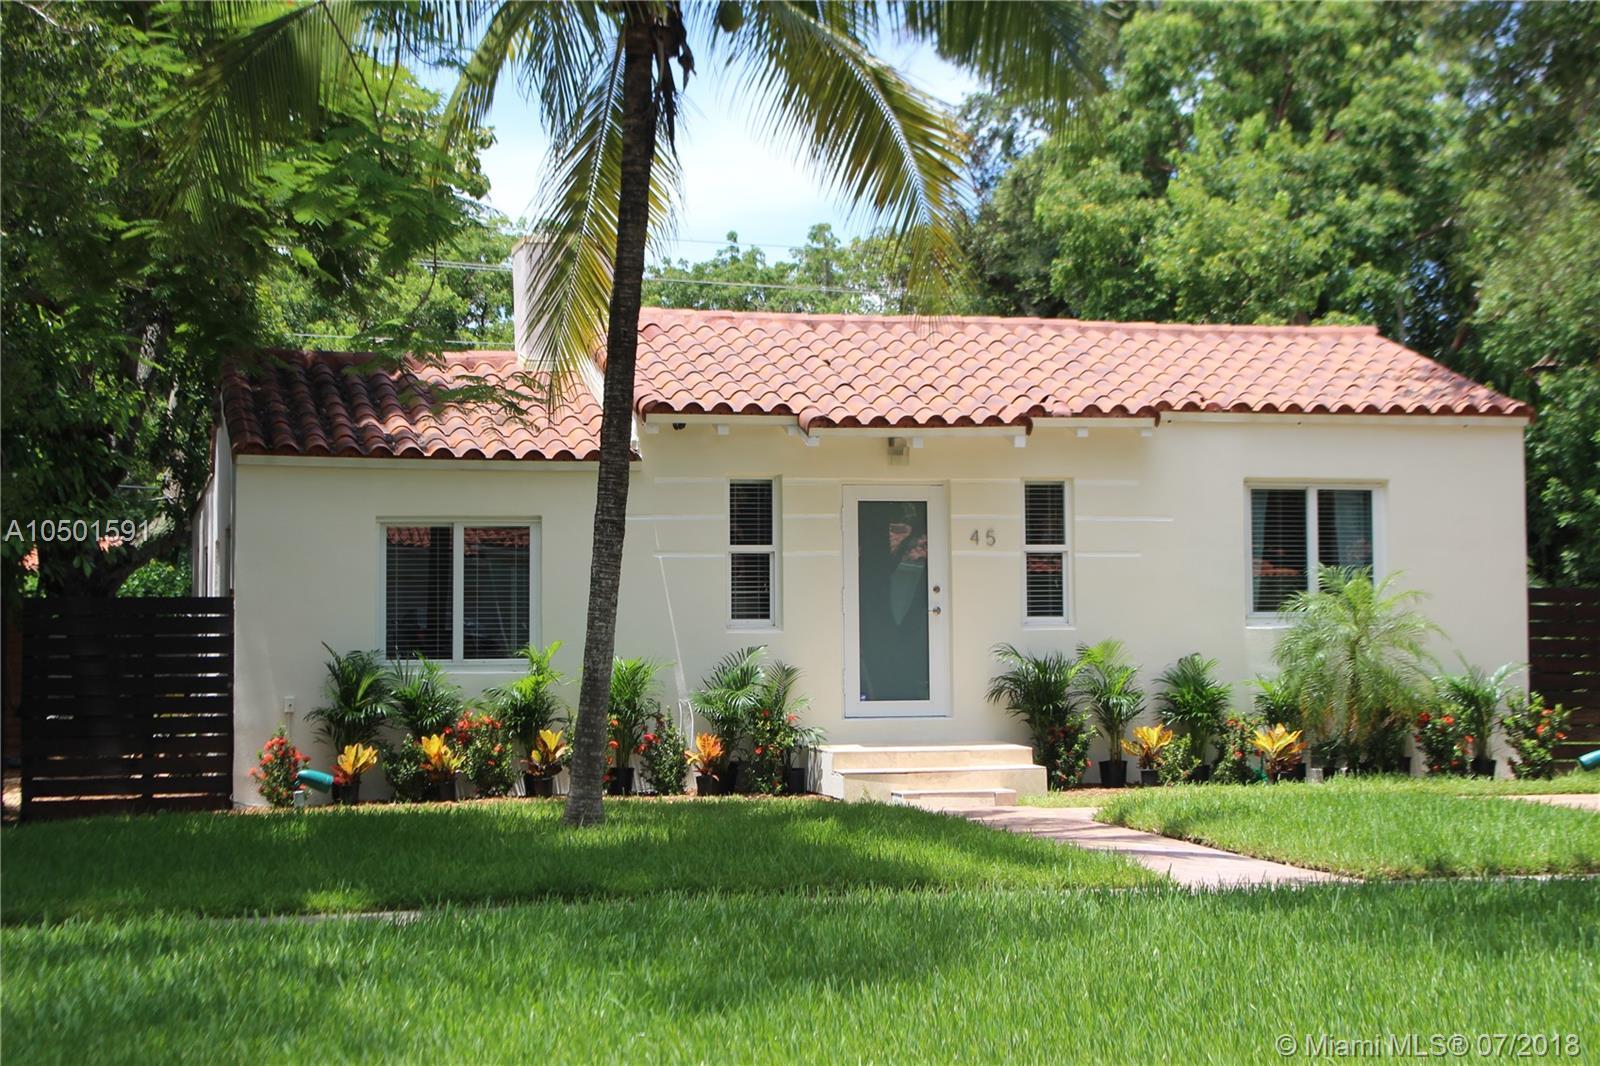 45 Nw 93rd St, Miami Shores FL, 33150